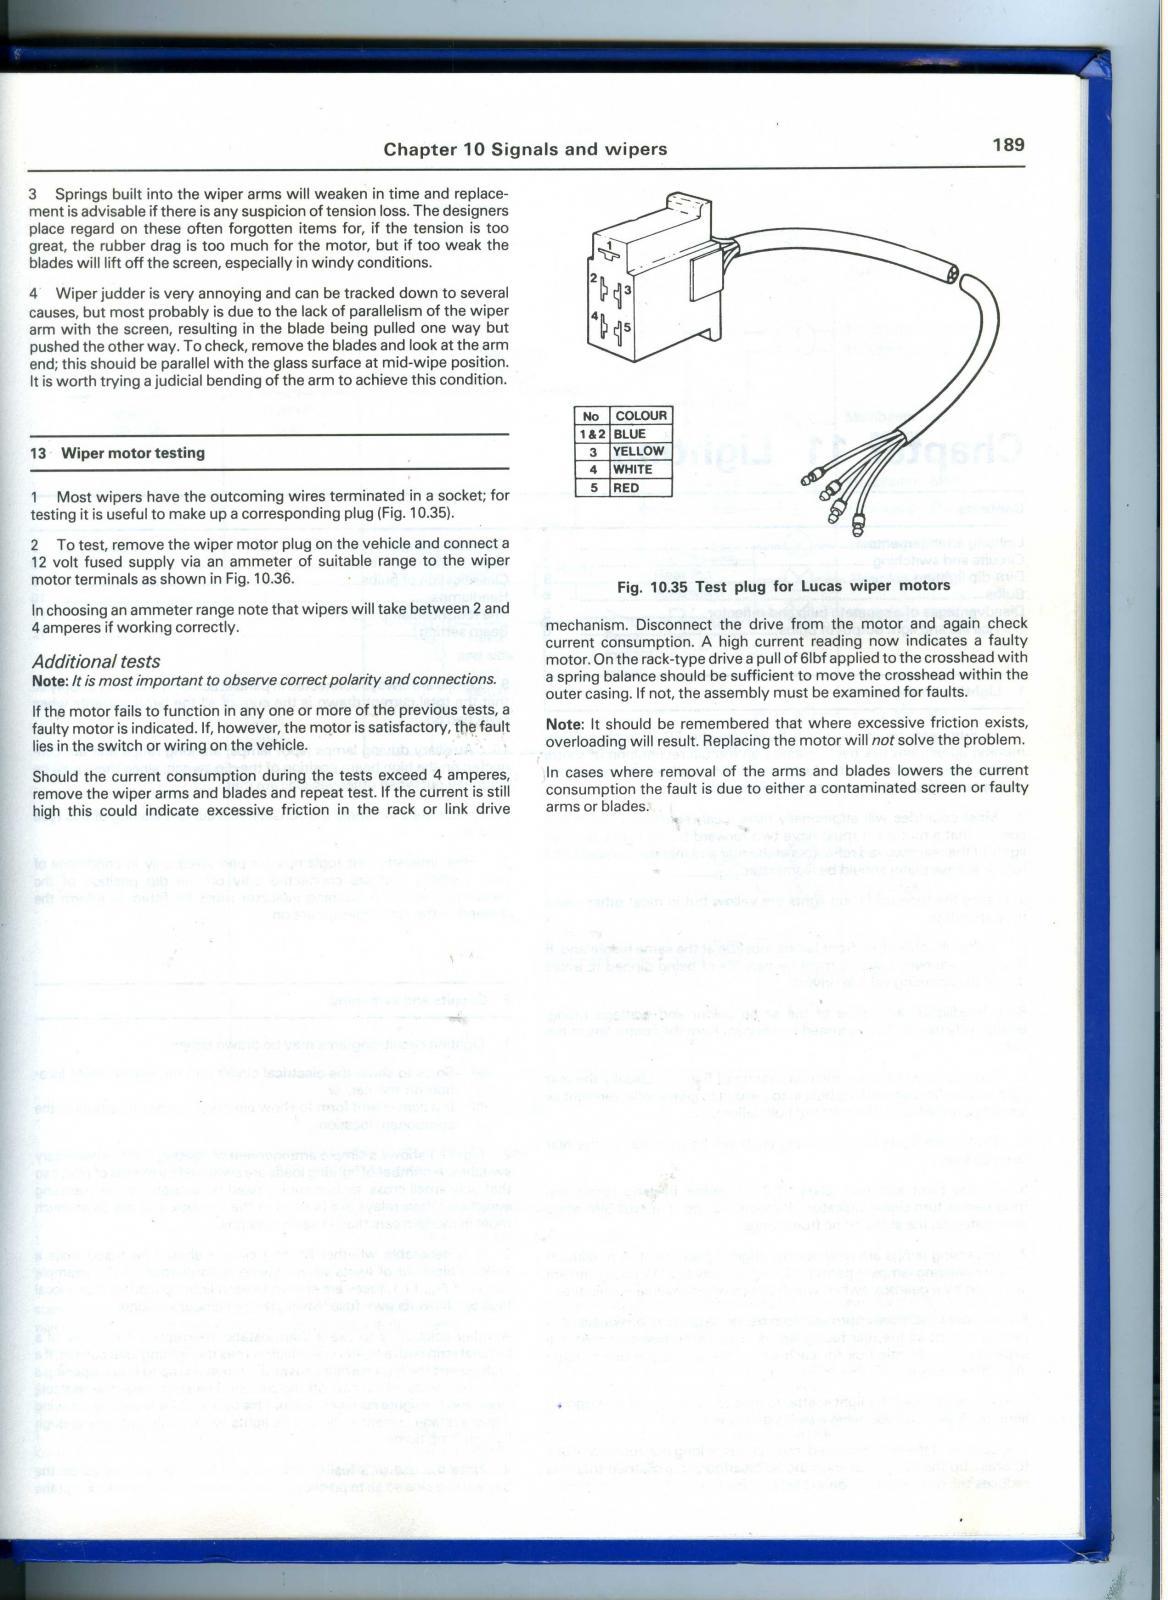 Testing Wiper Motor Defender Forum Lr4x4 The Land Rover Lucas Wiring Post 20 0 23997700 1416343416 Thumb